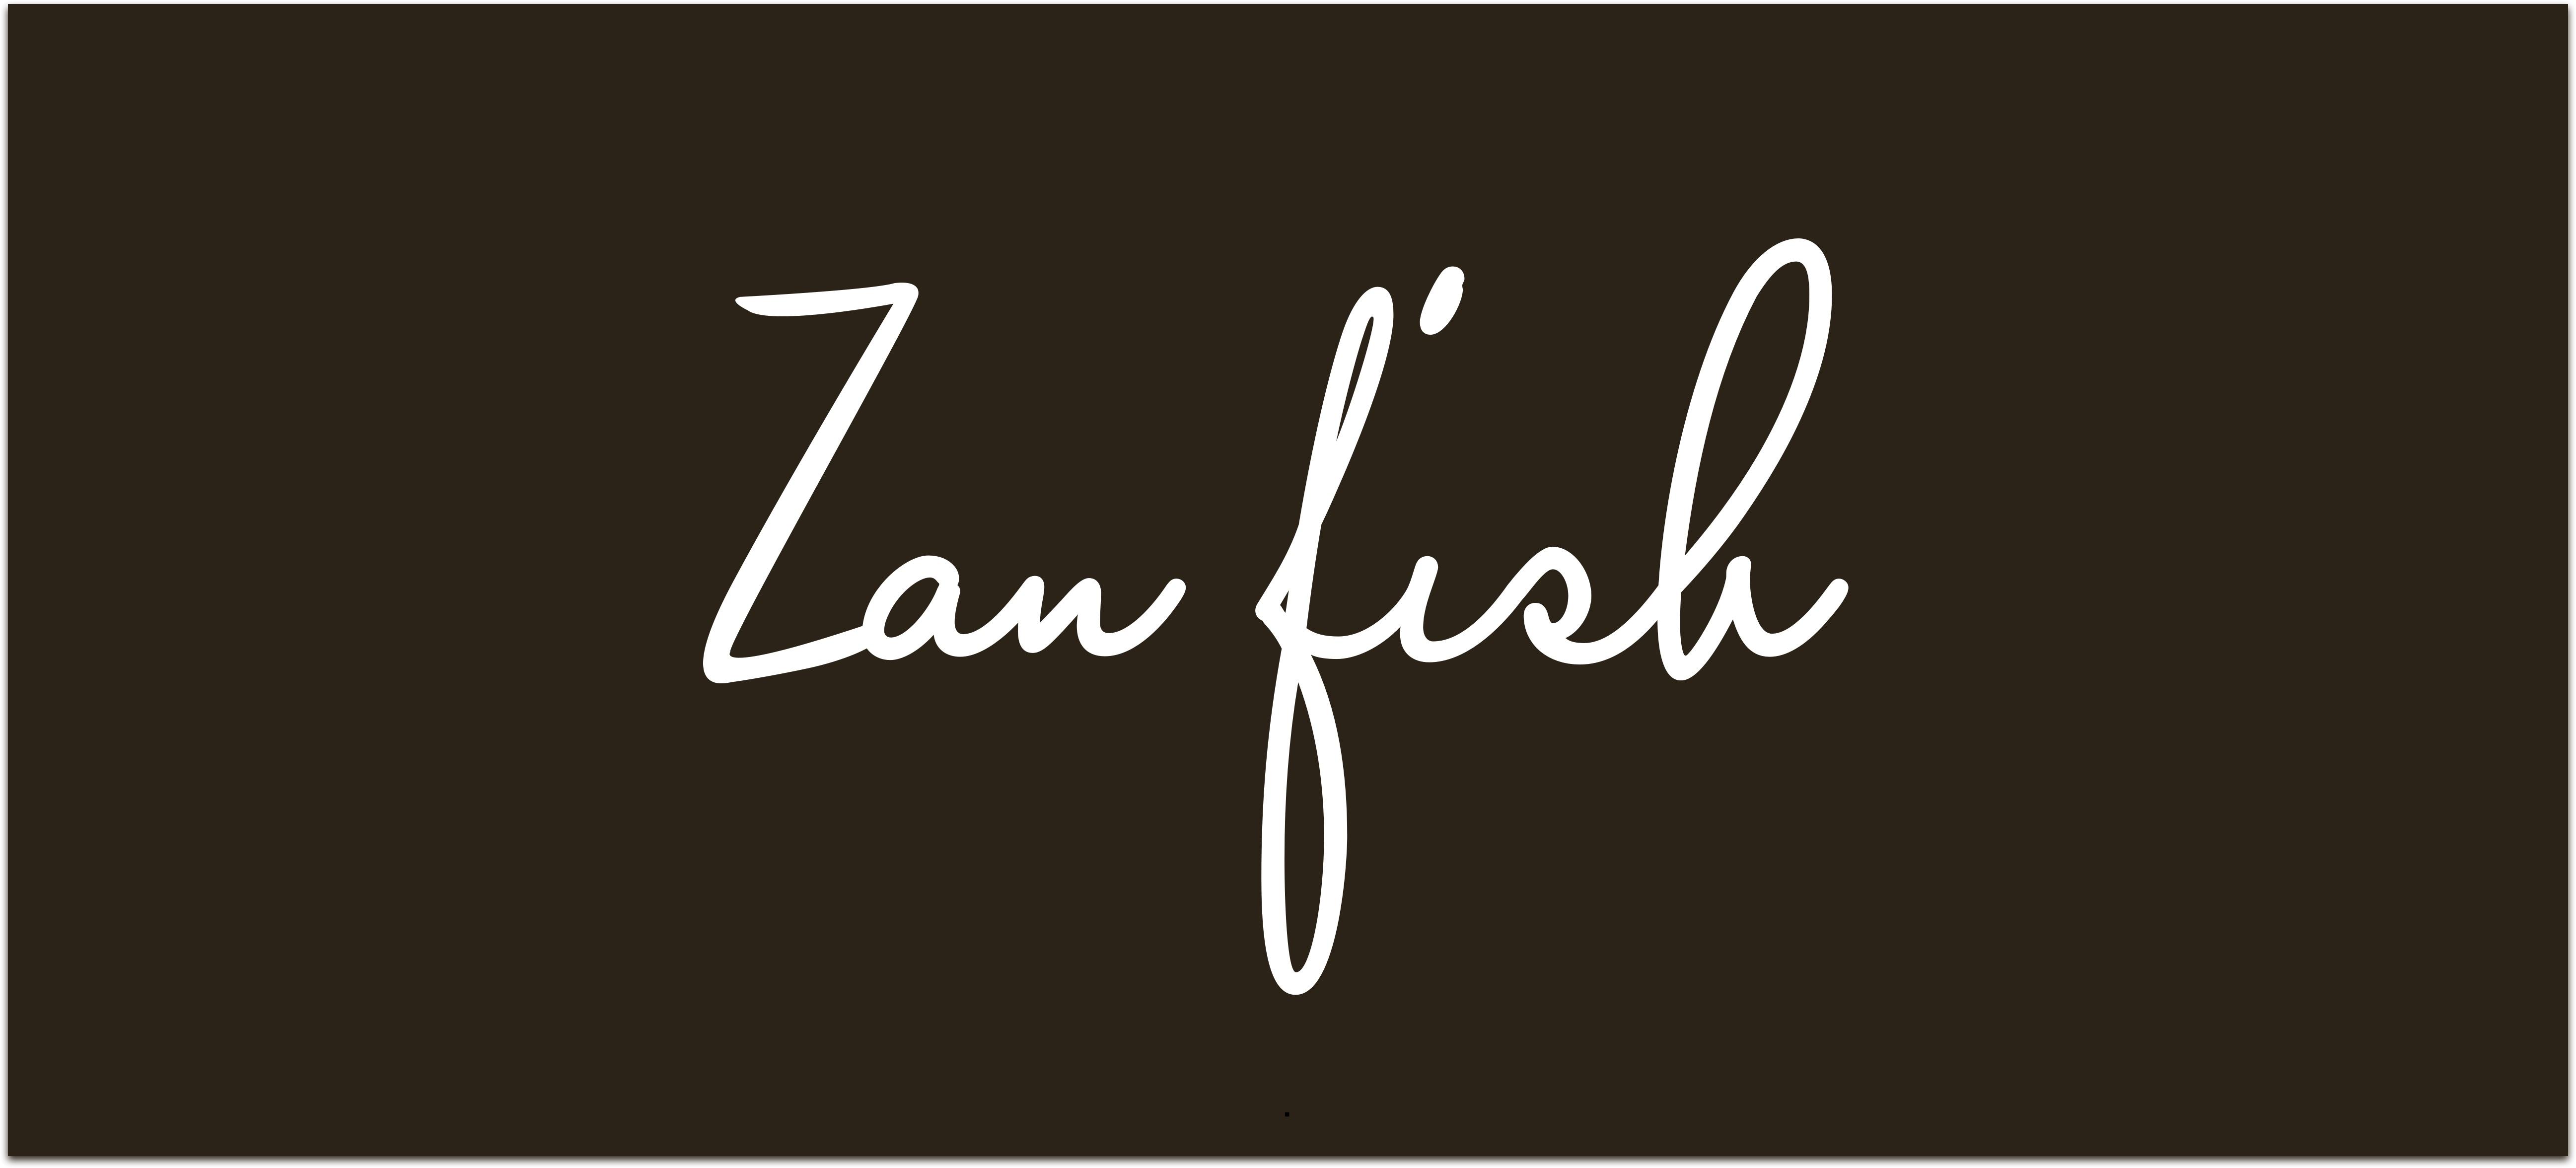 Zan Fish Eat Marketing